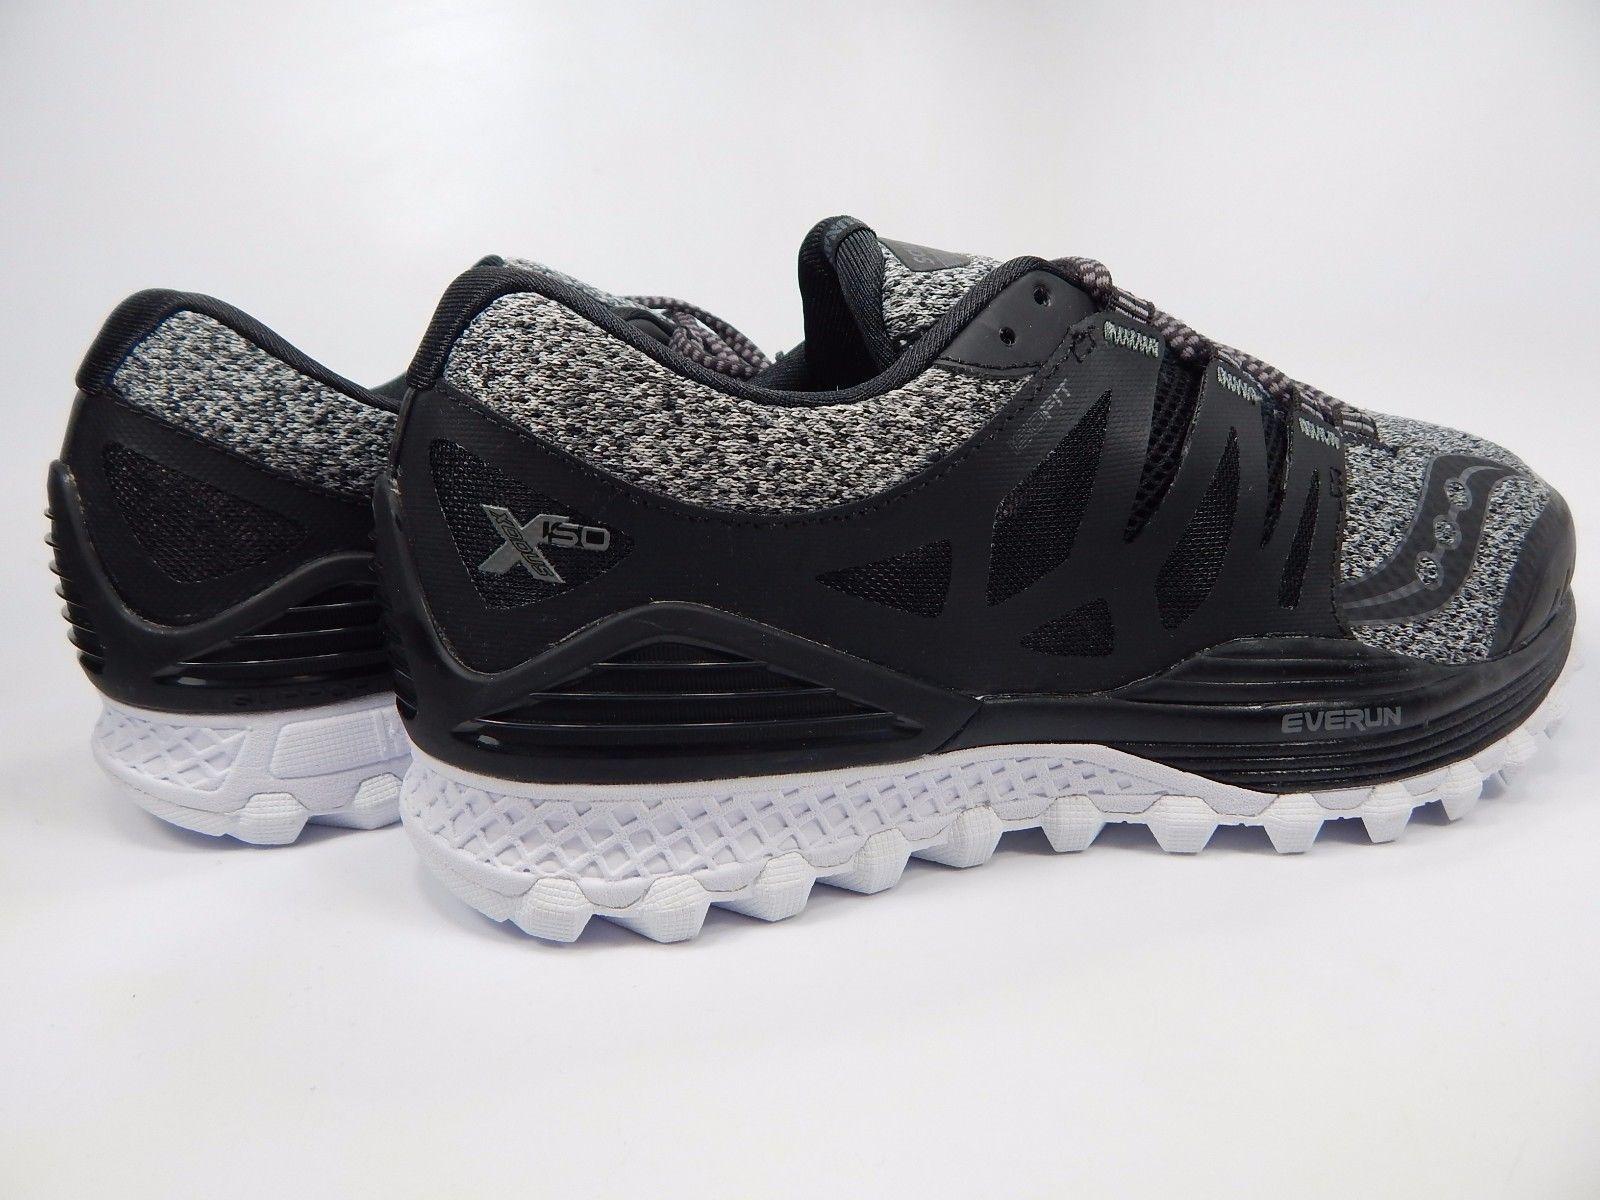 Saucony Xodus ISO LR Men's Running Shoes Sz 9 M (D) EU 42.5 Marl Black S20365-1